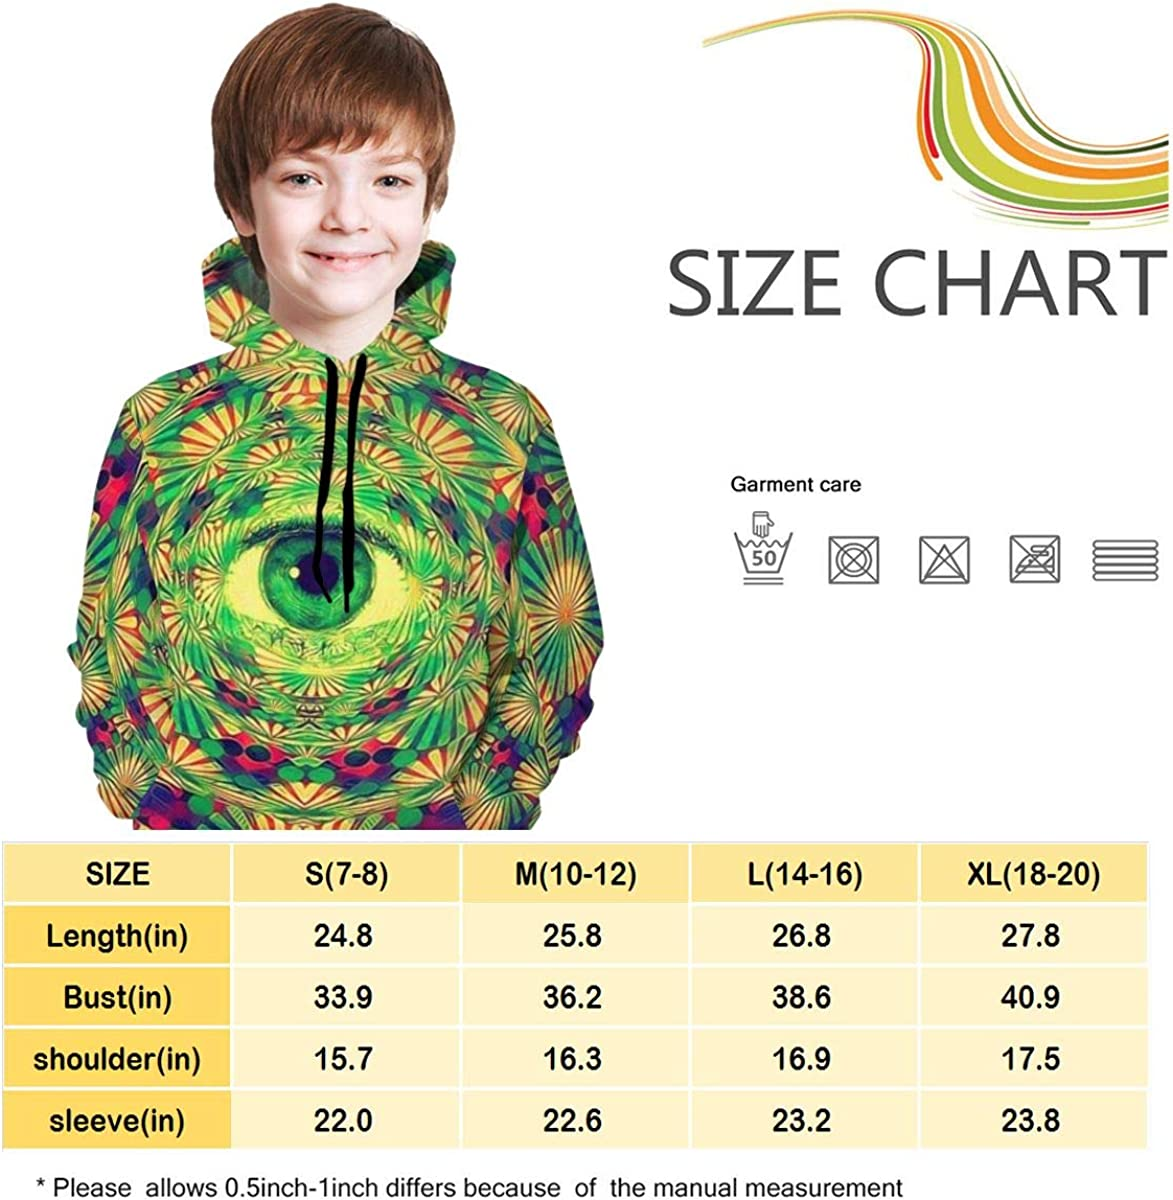 Kjiurhfyheuij Teens Pullover Hoodies with Pocket Tie Dye Weed Eye Fleece Hooded Sweatshirt for Youth Kids Boys Girls